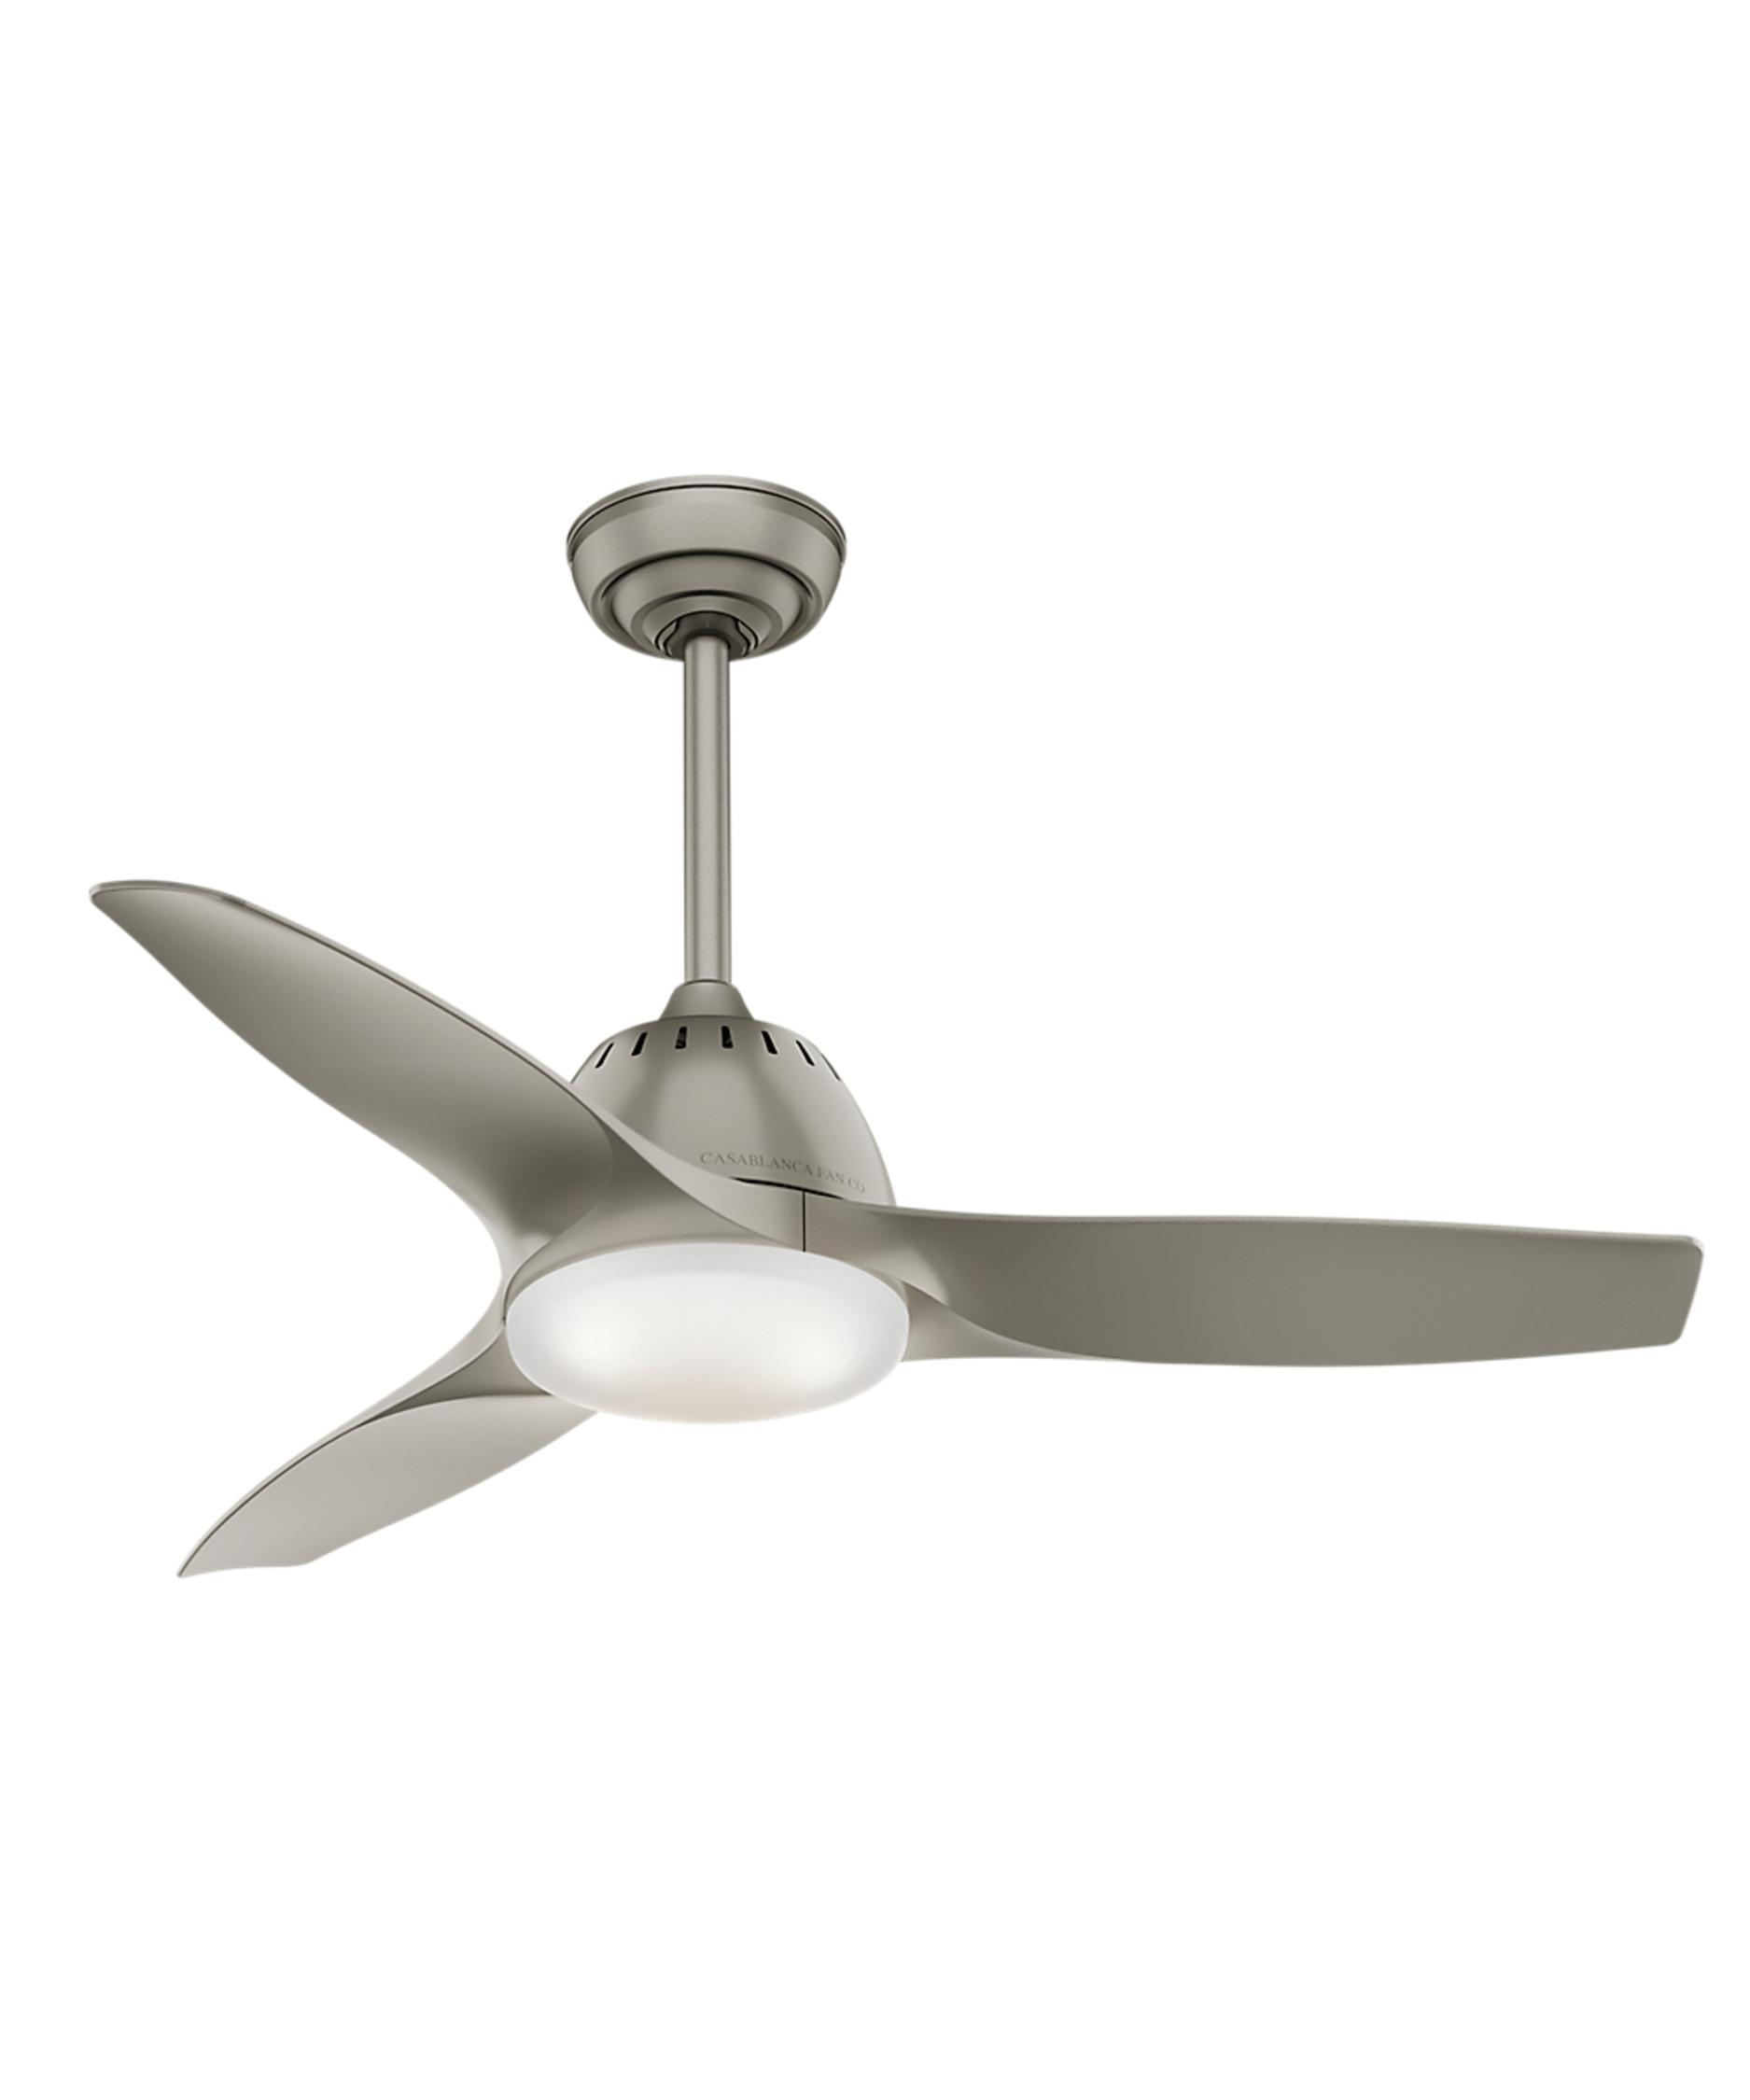 casablanca  wisp  inch  blade ceiling fan  capitol  - casablanca  wisp  inch  blade ceiling fan  capitol lightinglightingcom